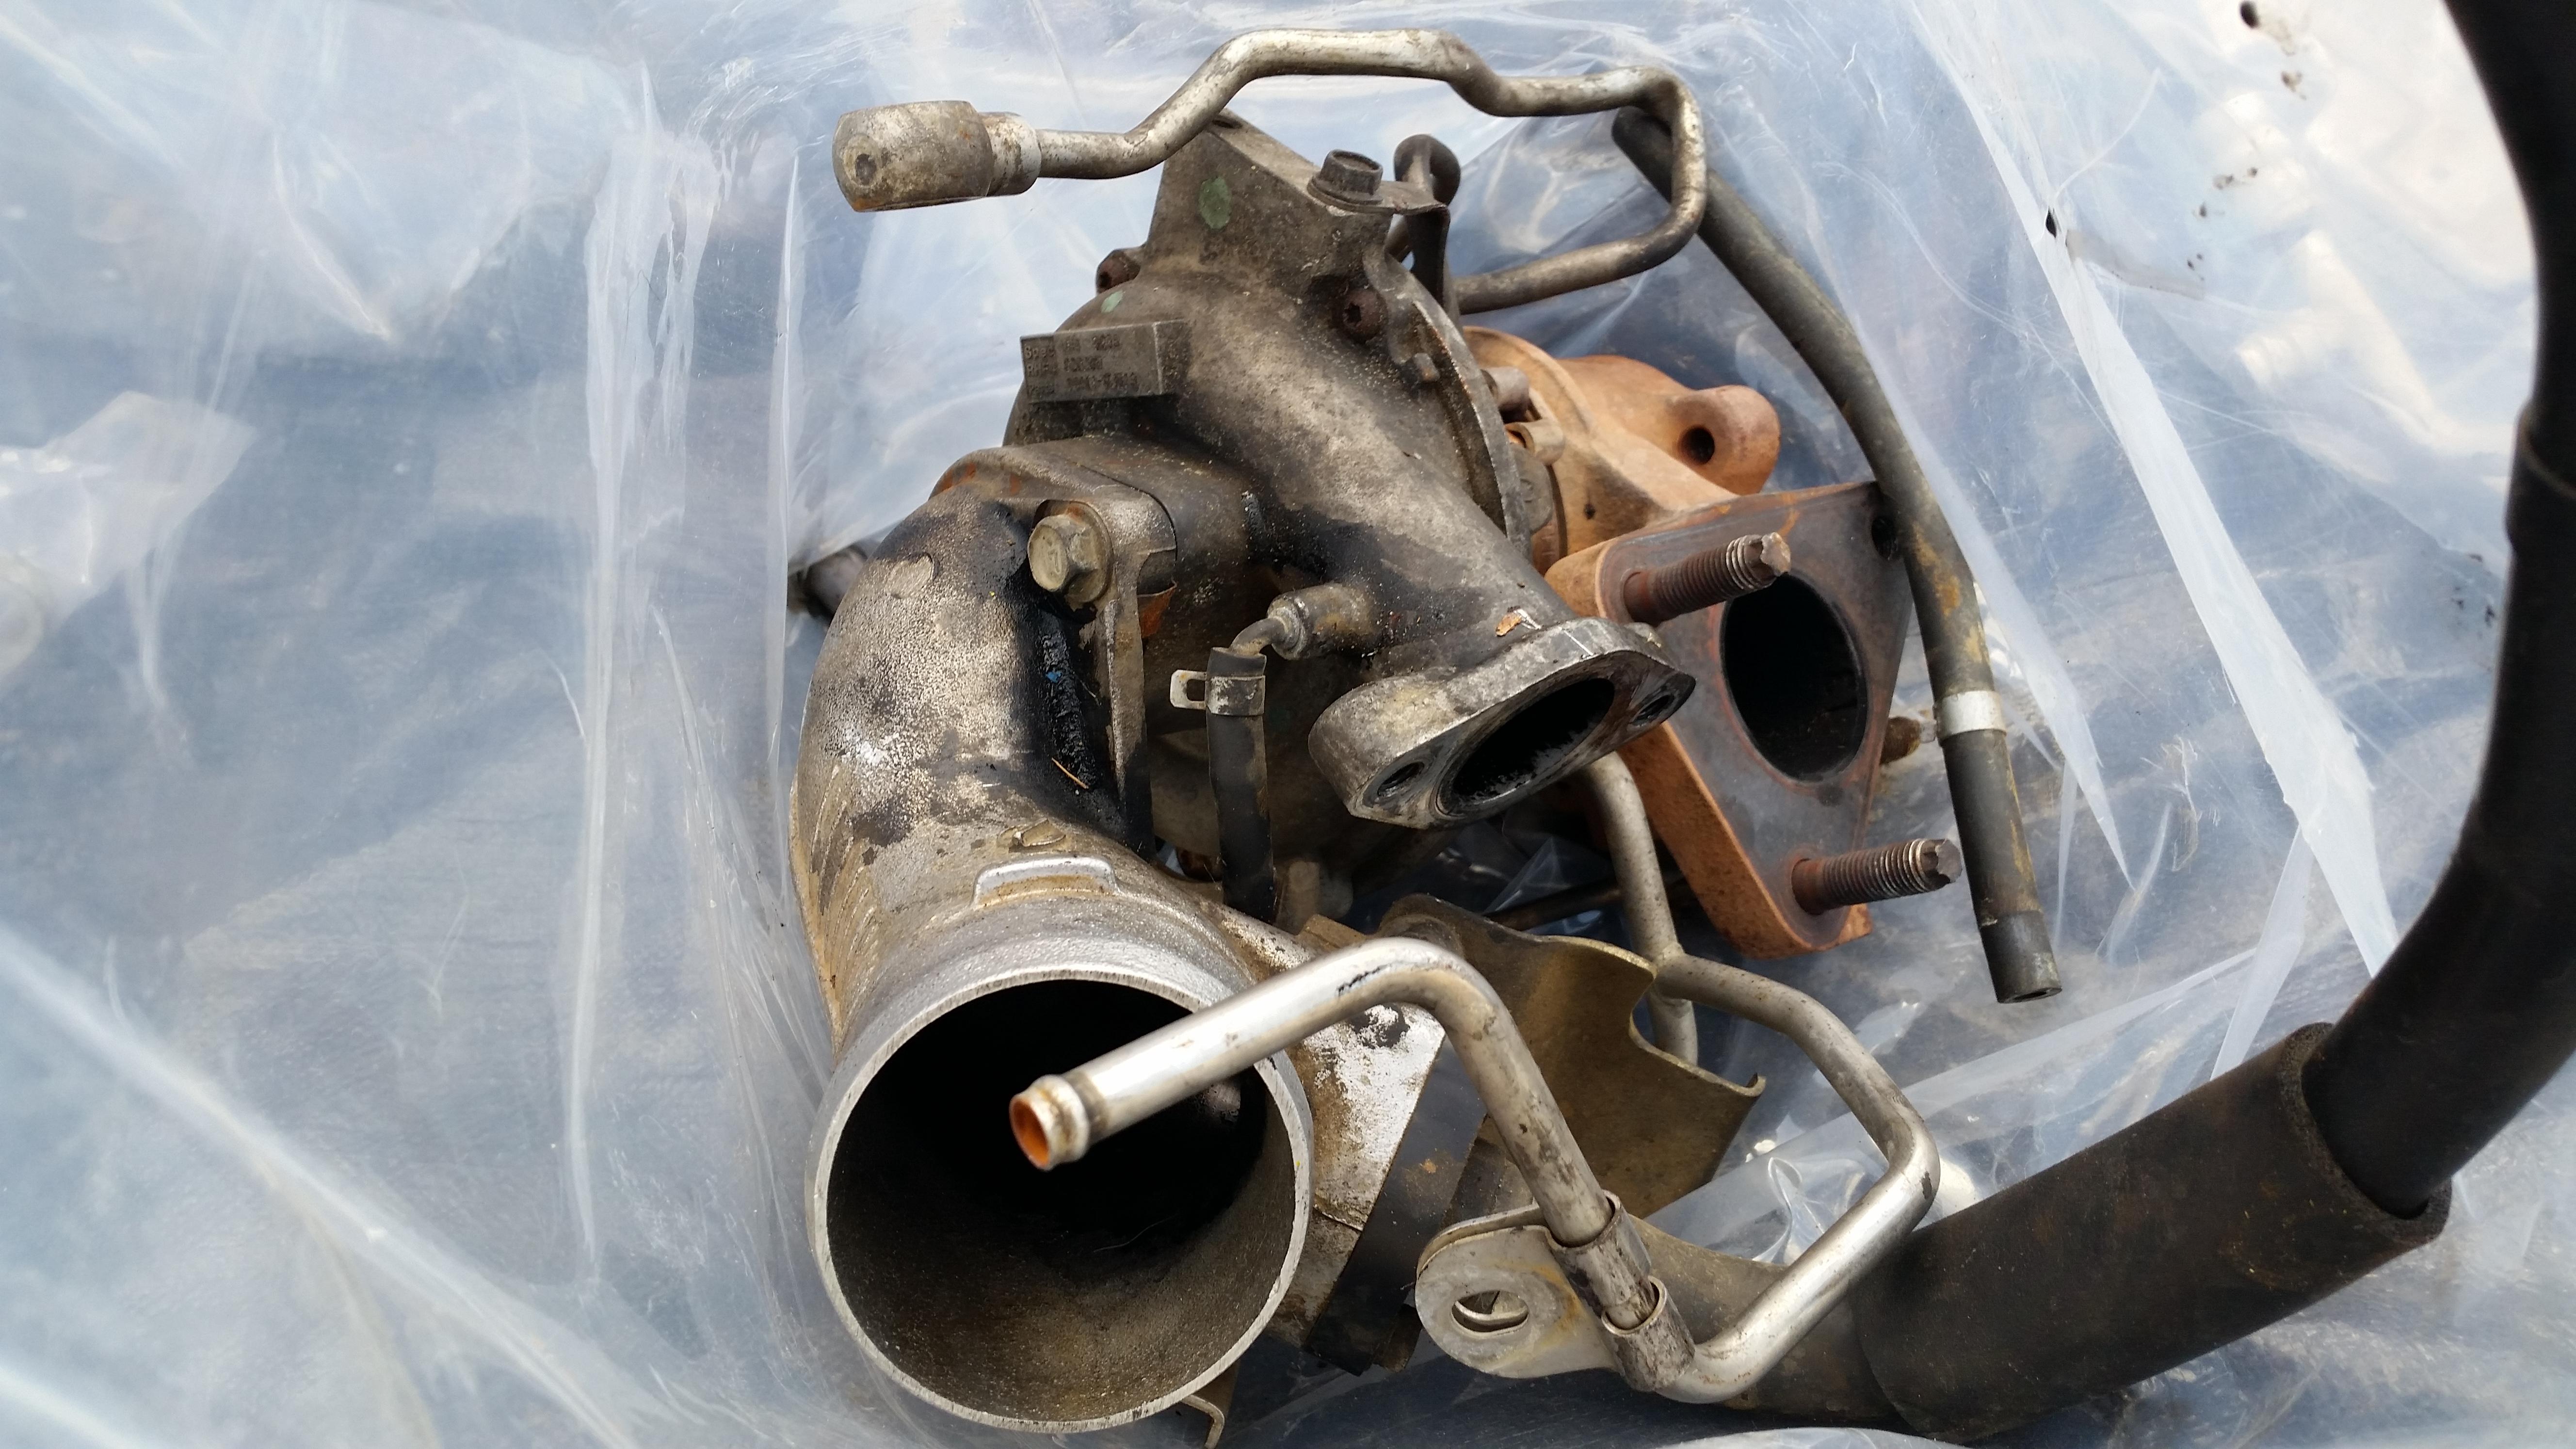 D22 Navara Gearbox Yd25 Engine Full Dual Batt Wiring Harness Car Brisbane